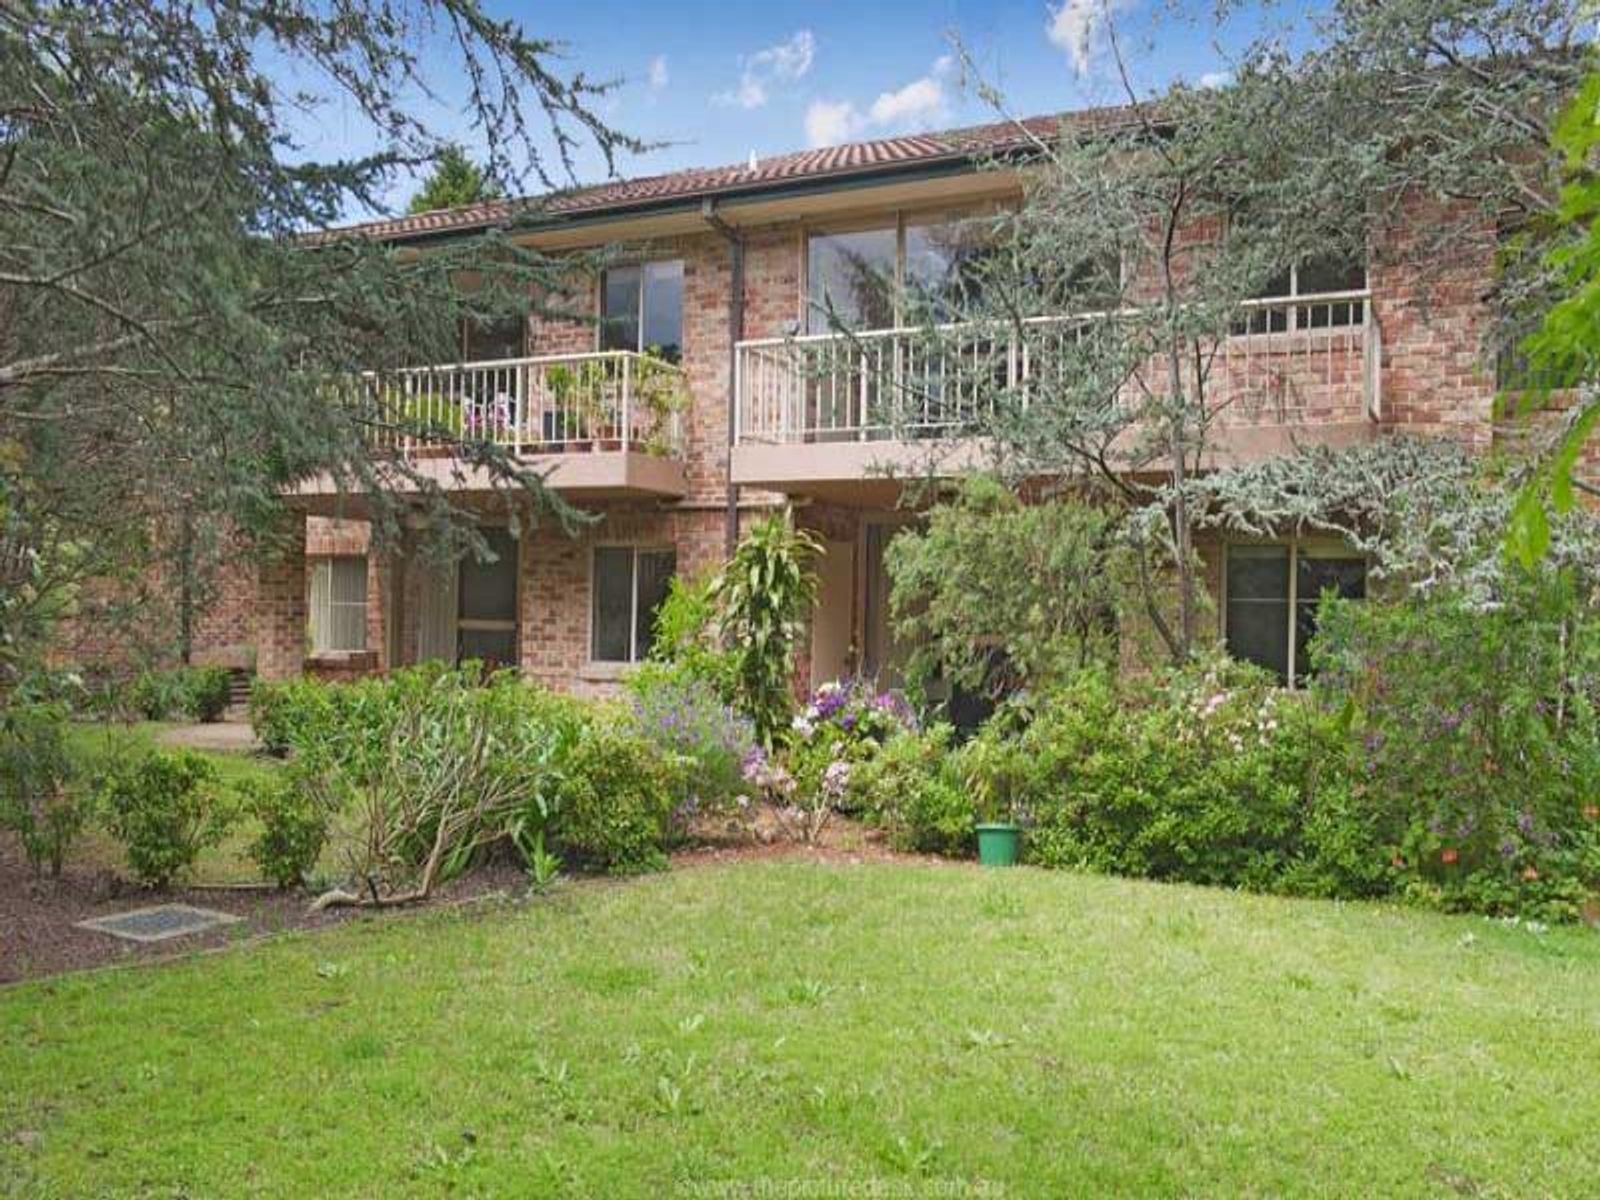 116/2-8 Kitchener Street, St Ives, NSW 2075